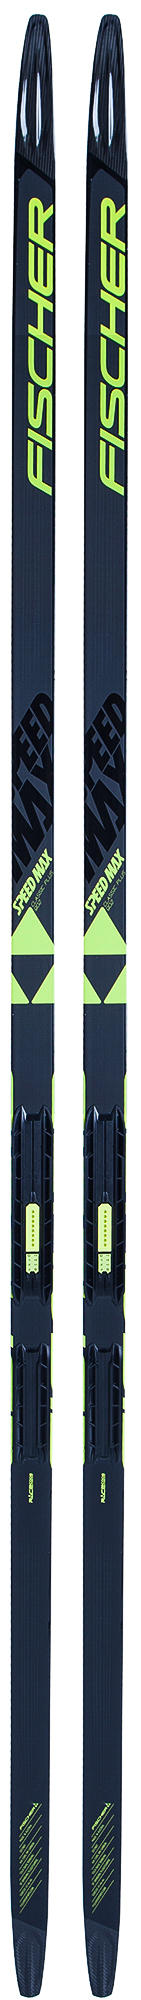 цена Fischer Беговые лыжи Fischer Speedmax CL 902 Plus Stiff IFP онлайн в 2017 году